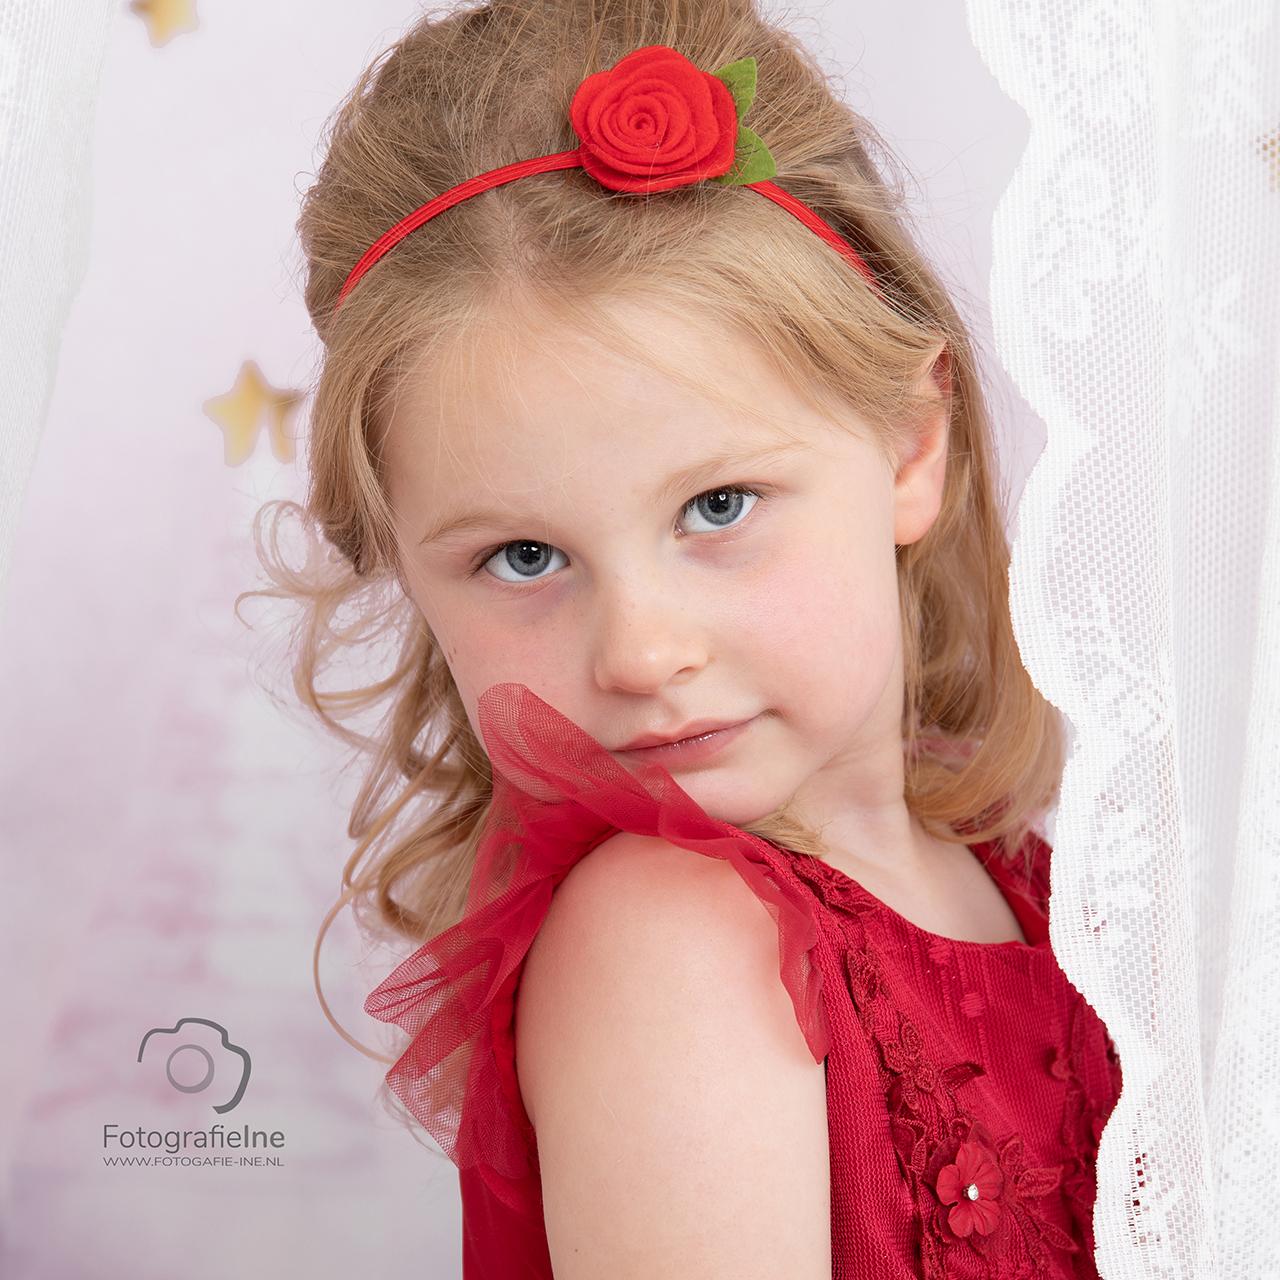 Fotografie Ine Prinsessen fotoshoot rode jurk